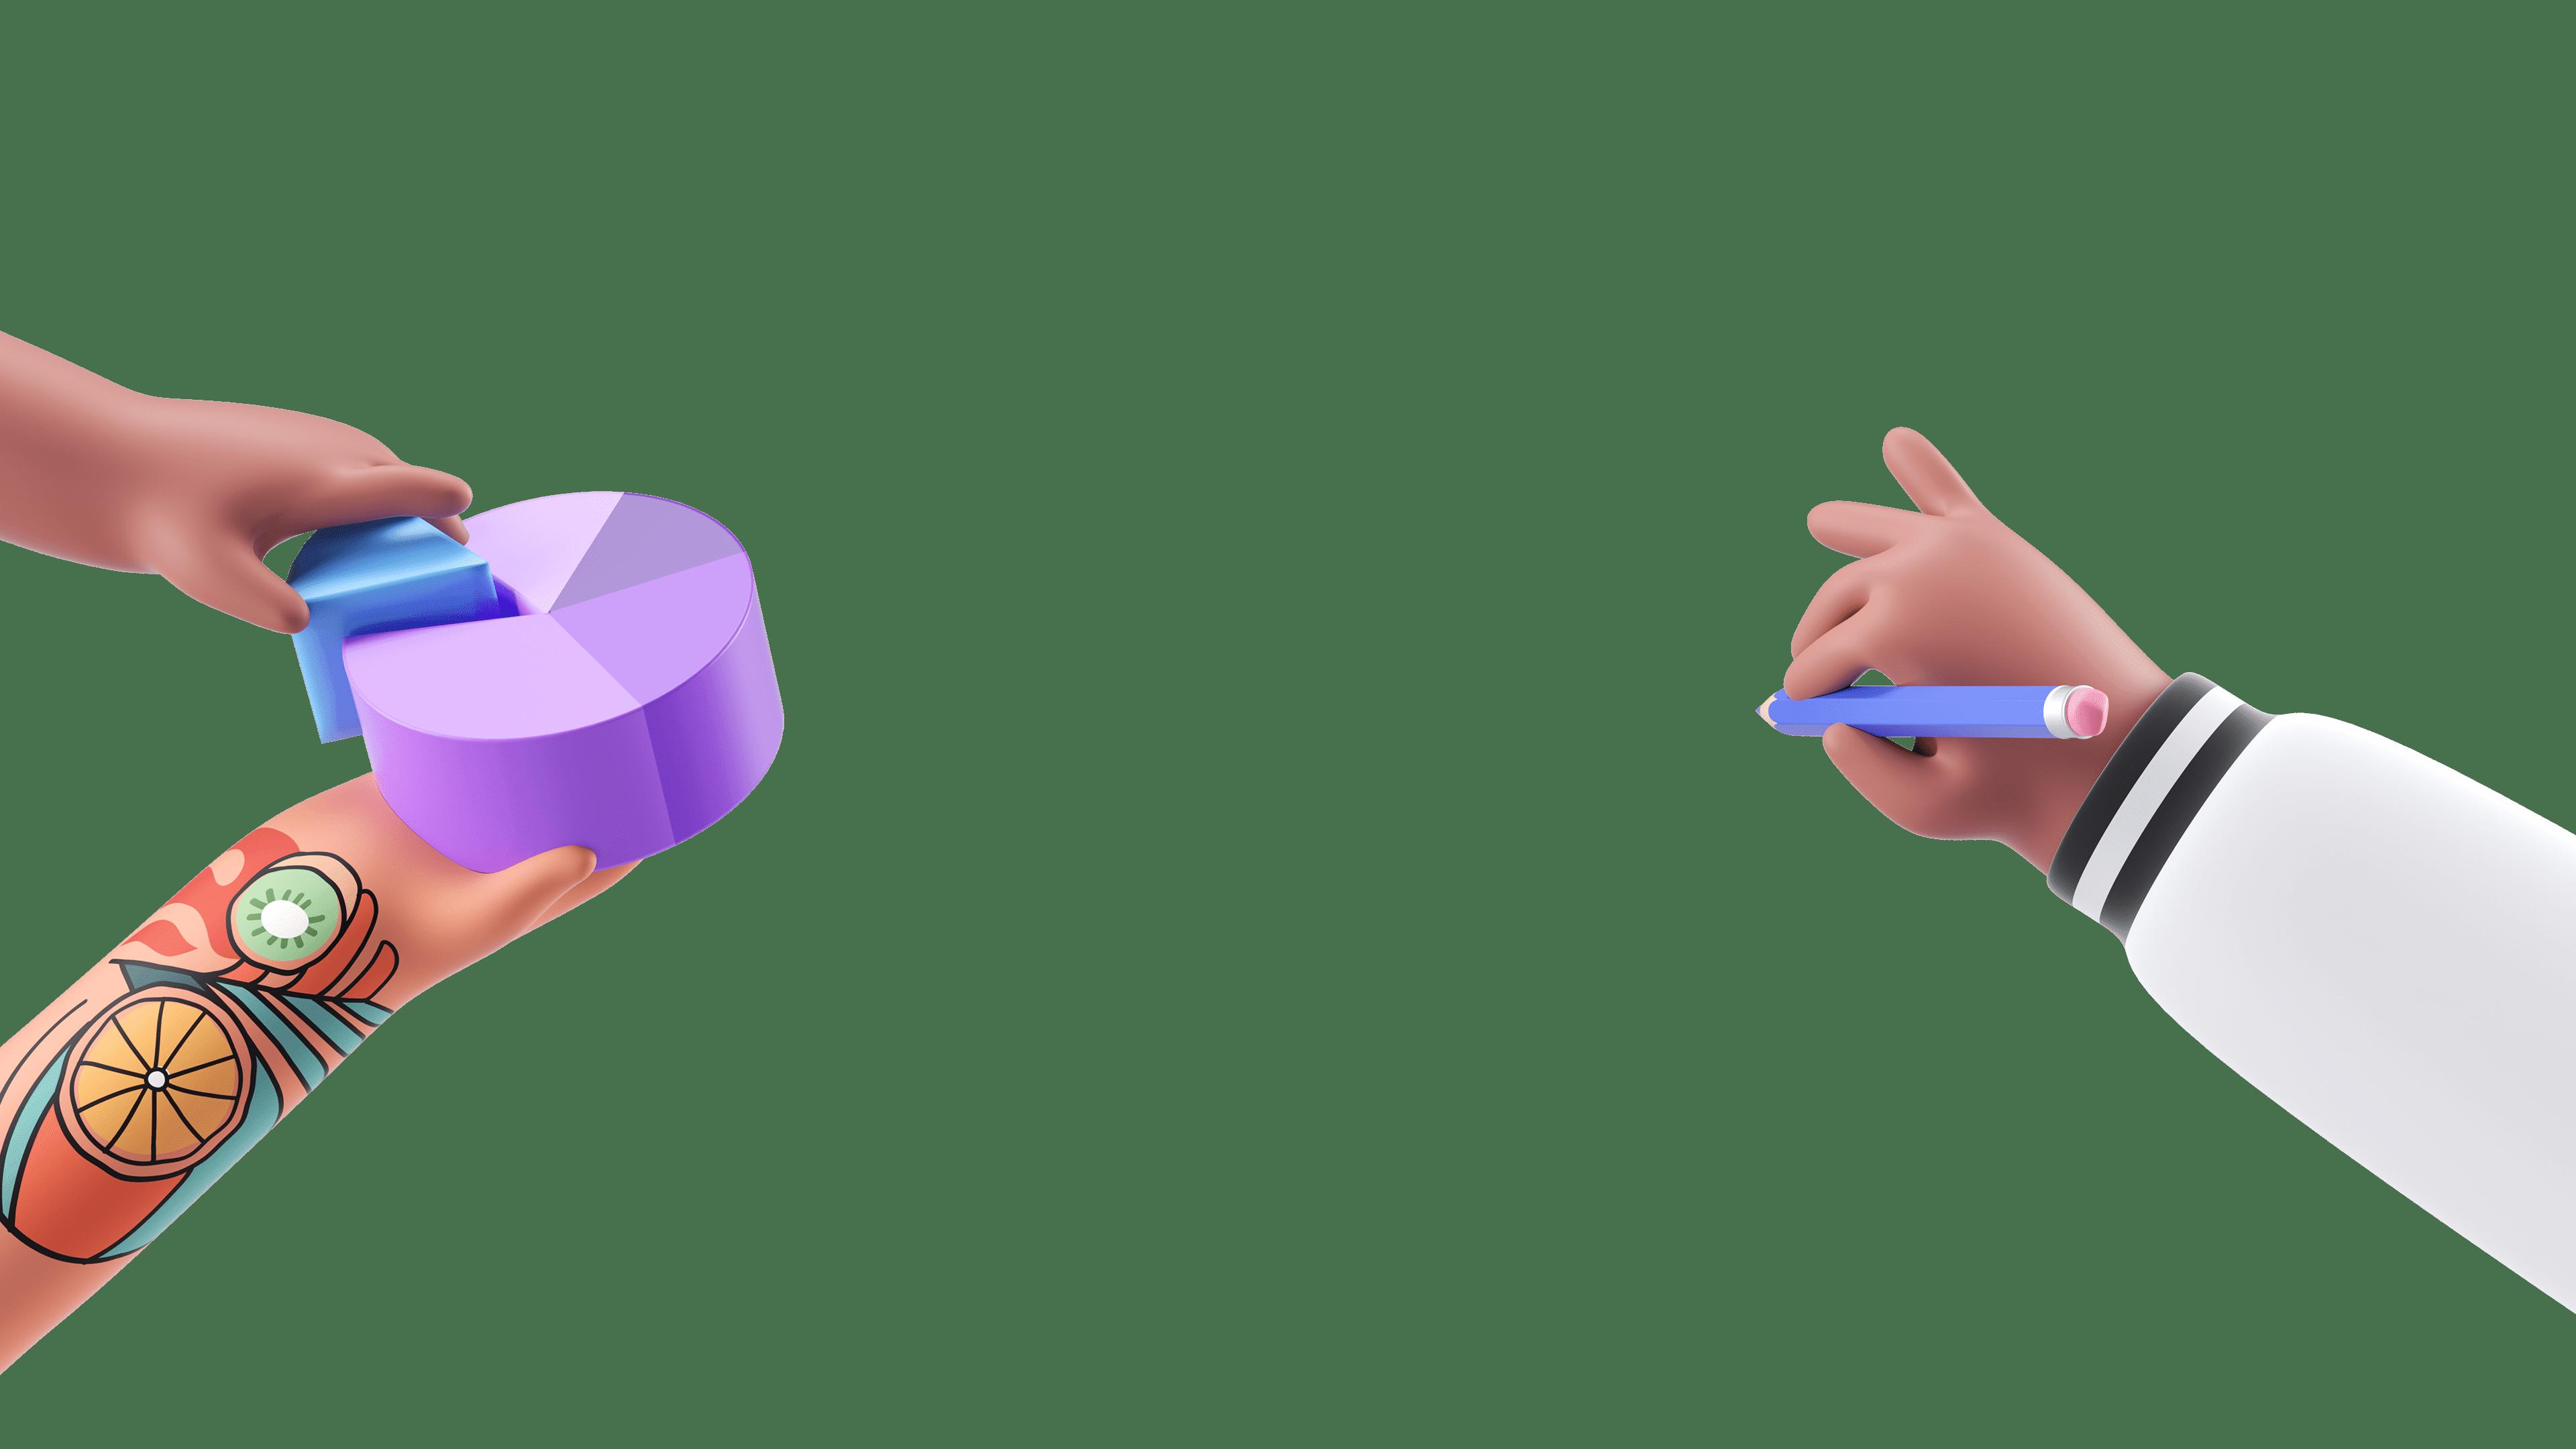 animated student hands - hero - nimt school